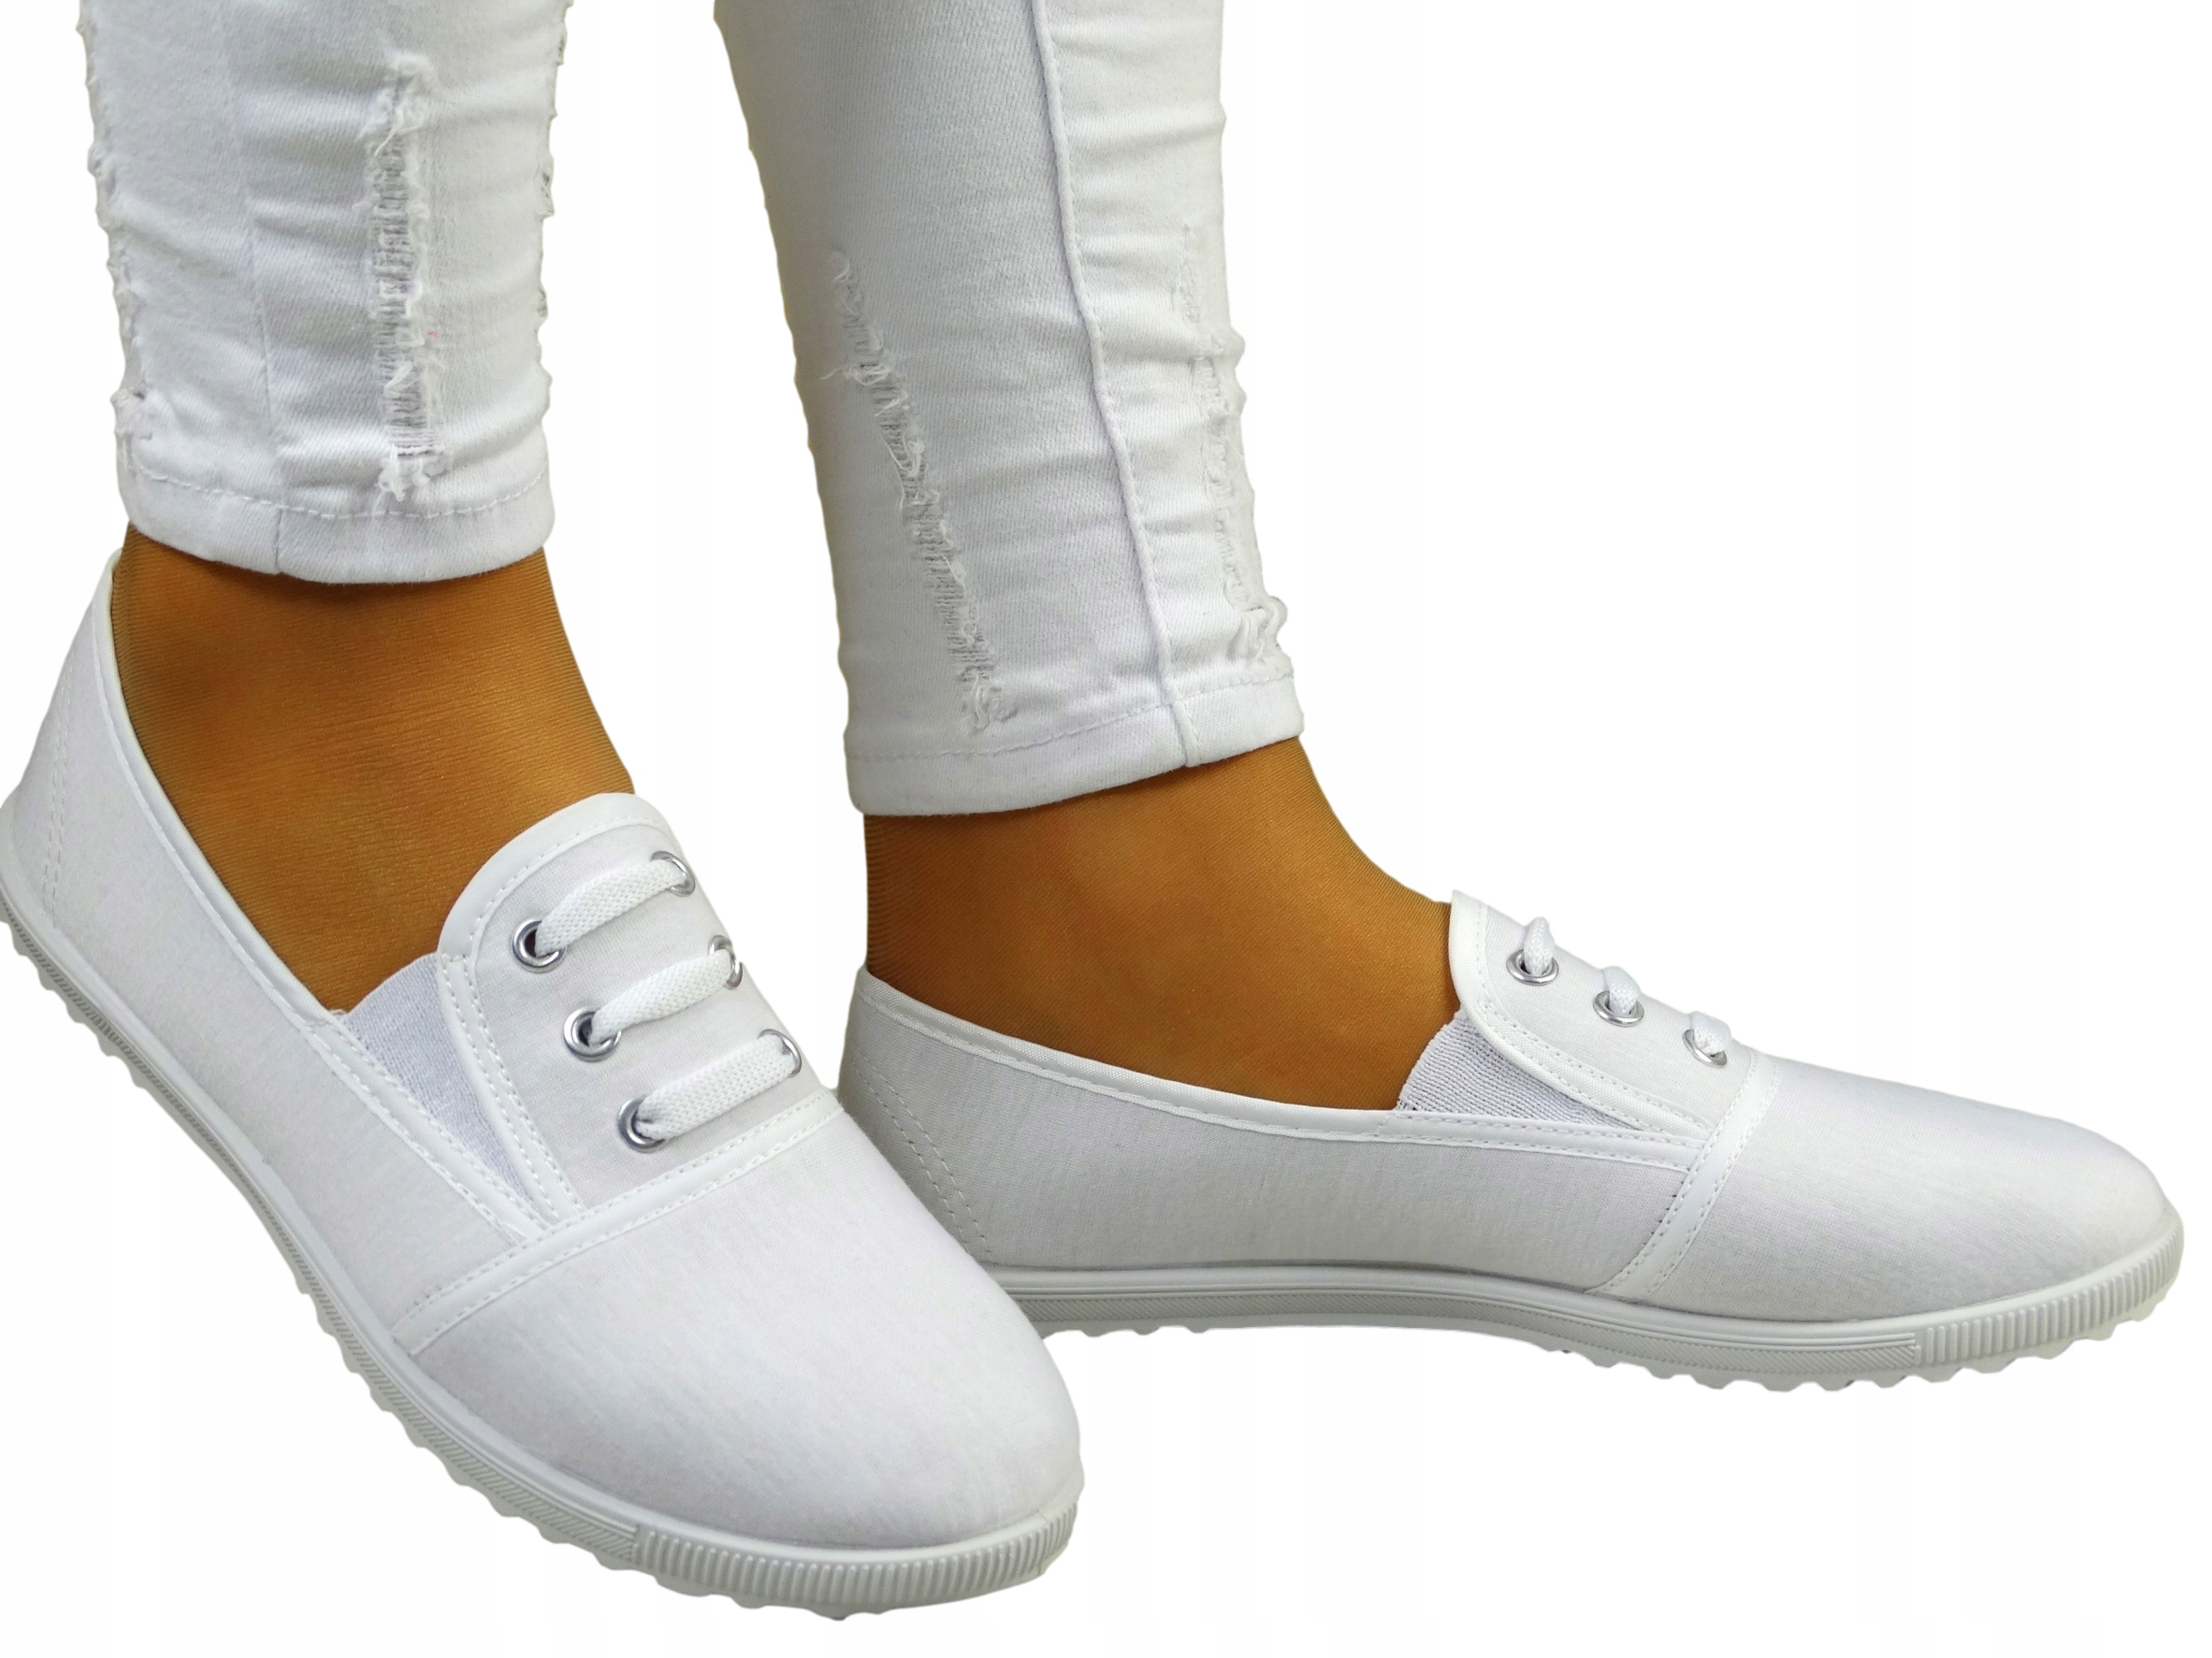 Biele Ballerinas tenisky s ďasná